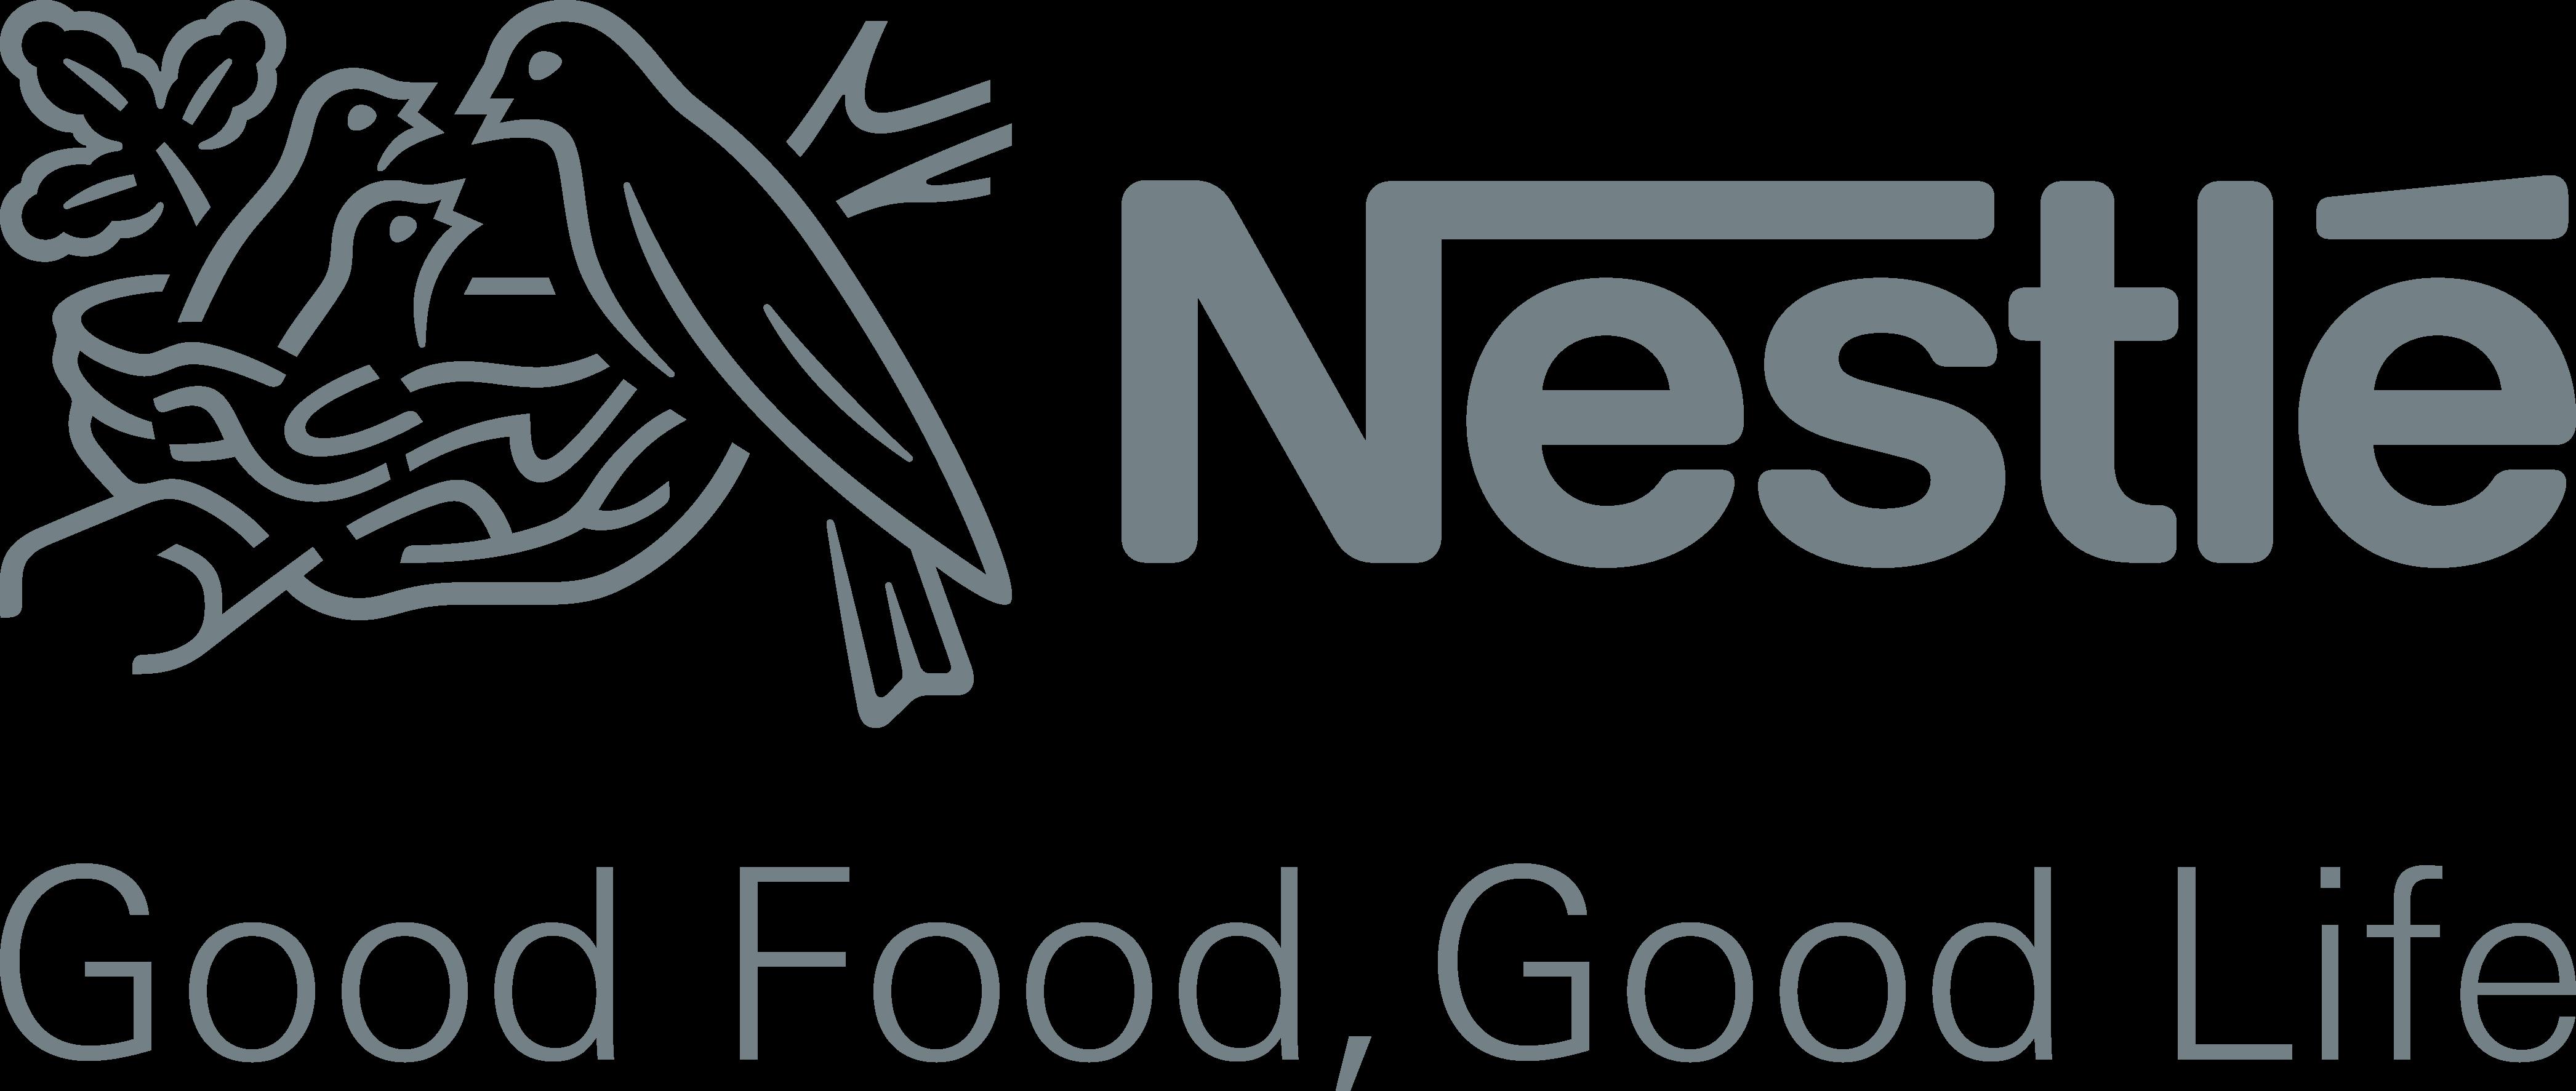 Working at NESTLÉ.